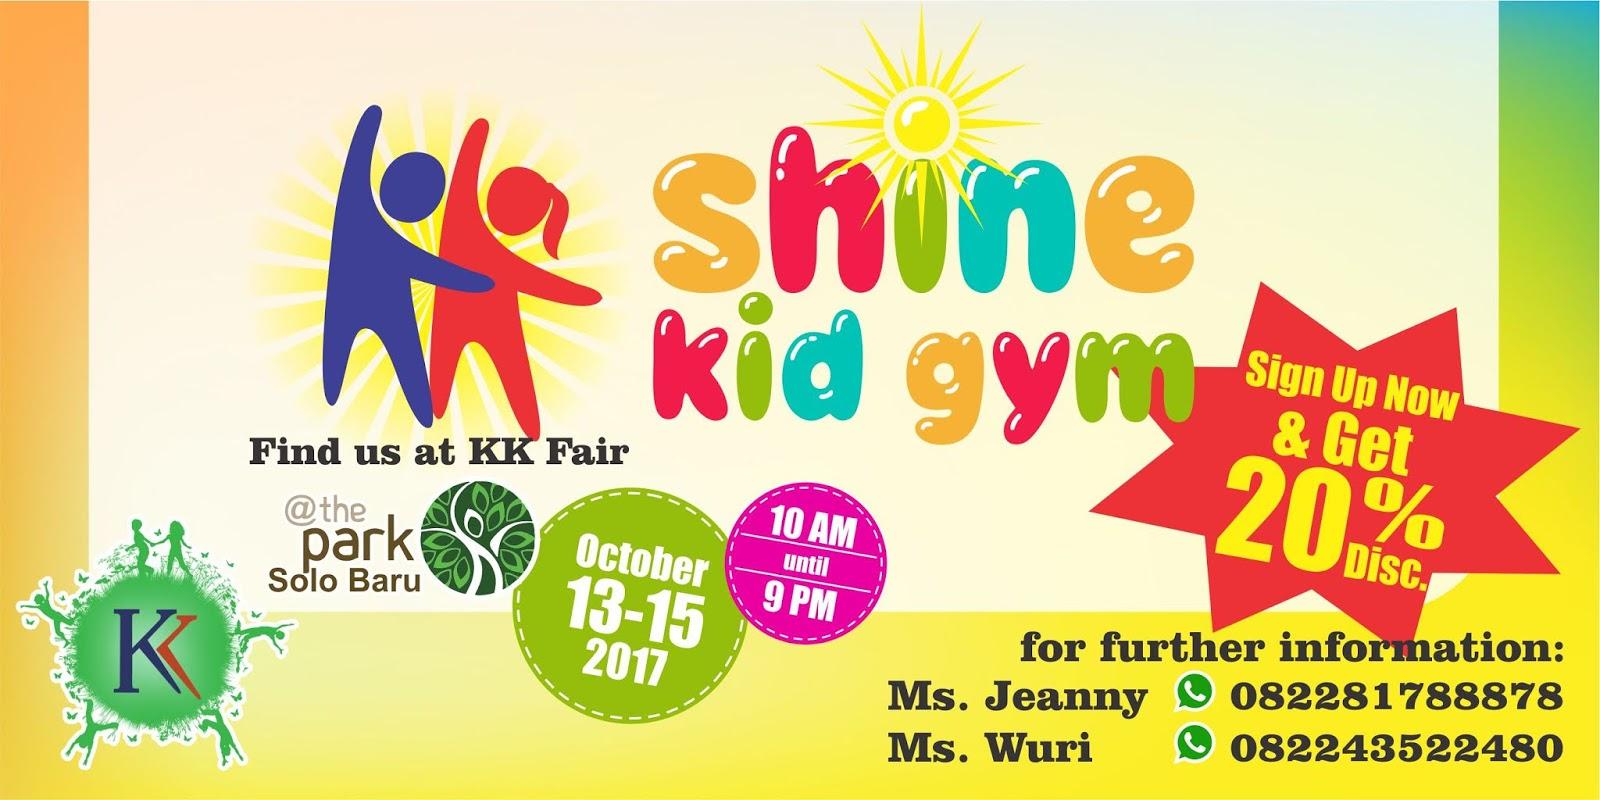 Buka Pendaftaran di KK Fair, Shine Kid Gym Berikan Diskon 20%